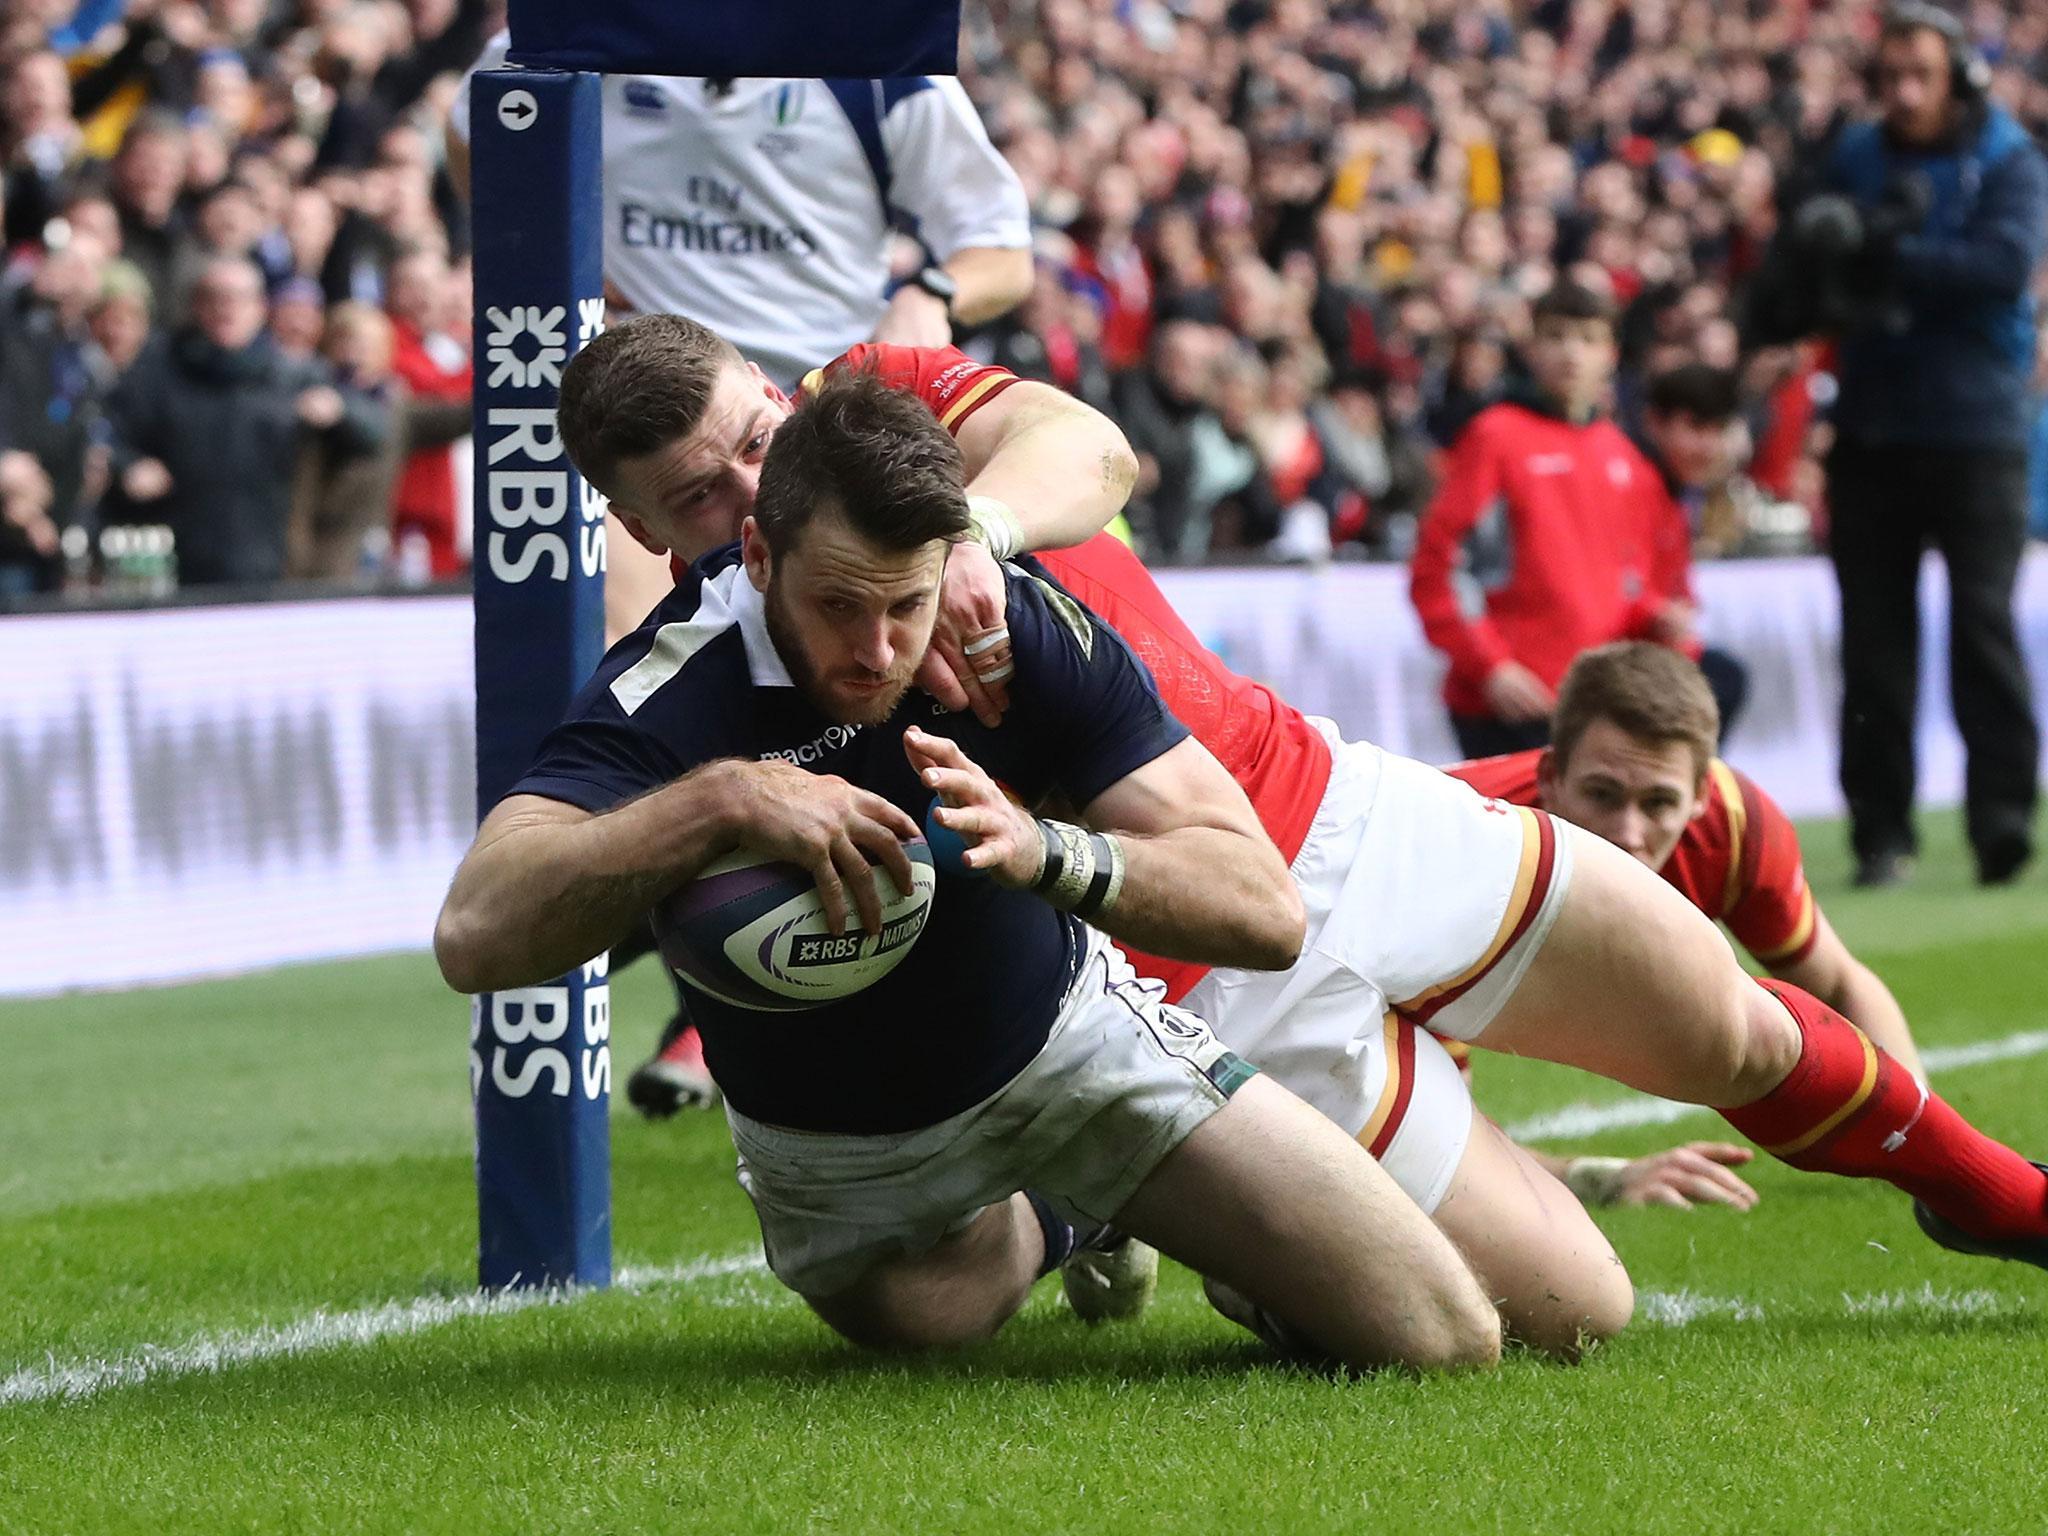 Six Nations 2018 LIVE: England vs Wales updates